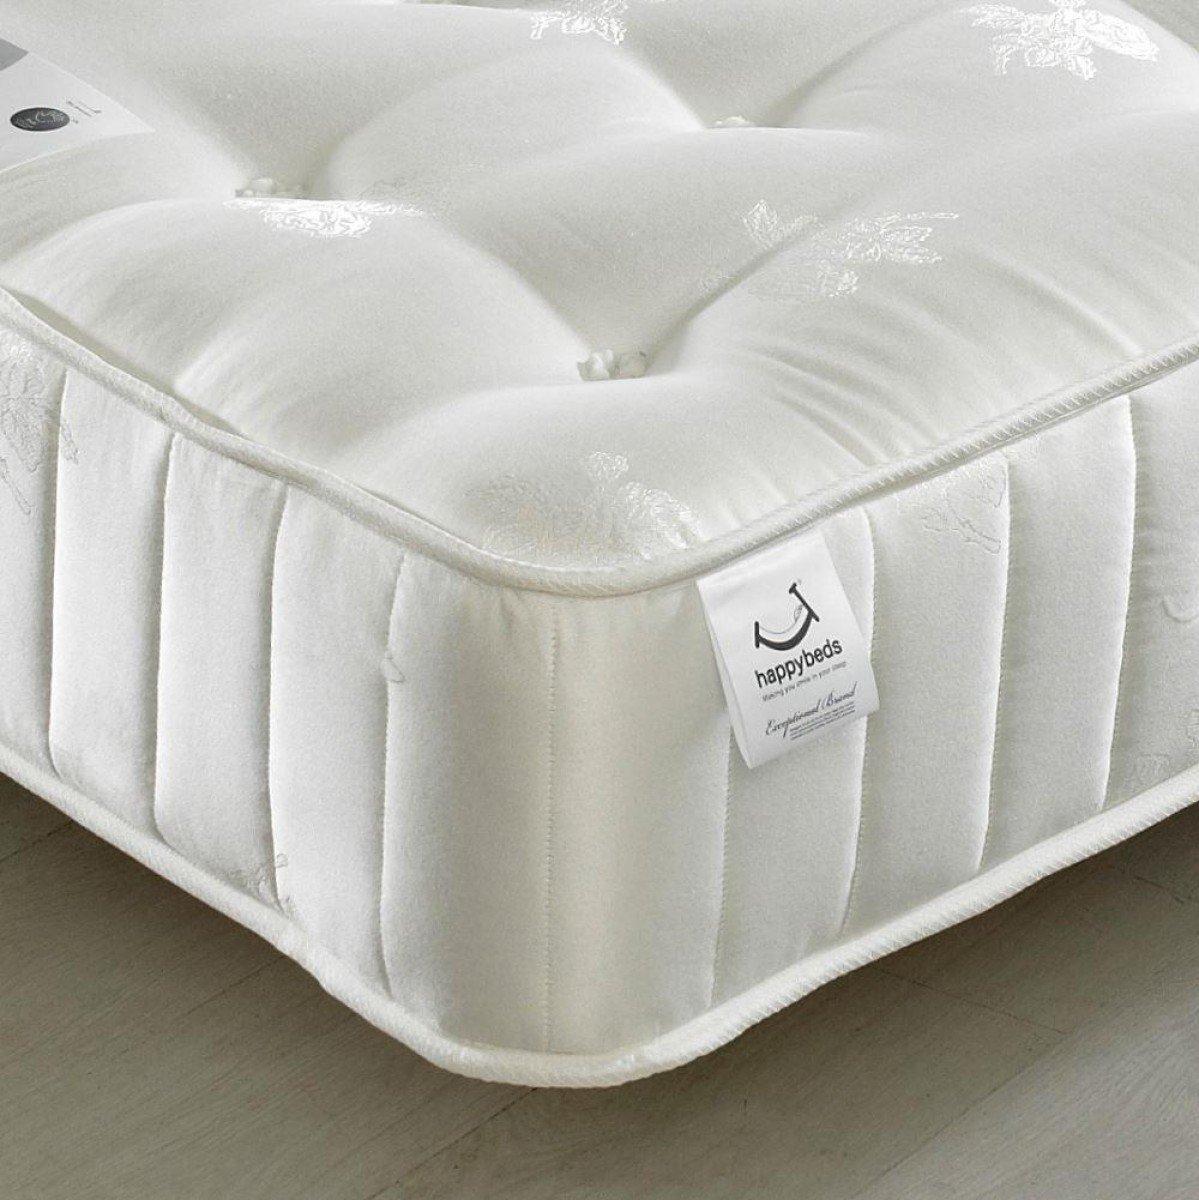 3000 pocket sprung mattress - £304.99 delivered @ HappyBeds. Sale on now